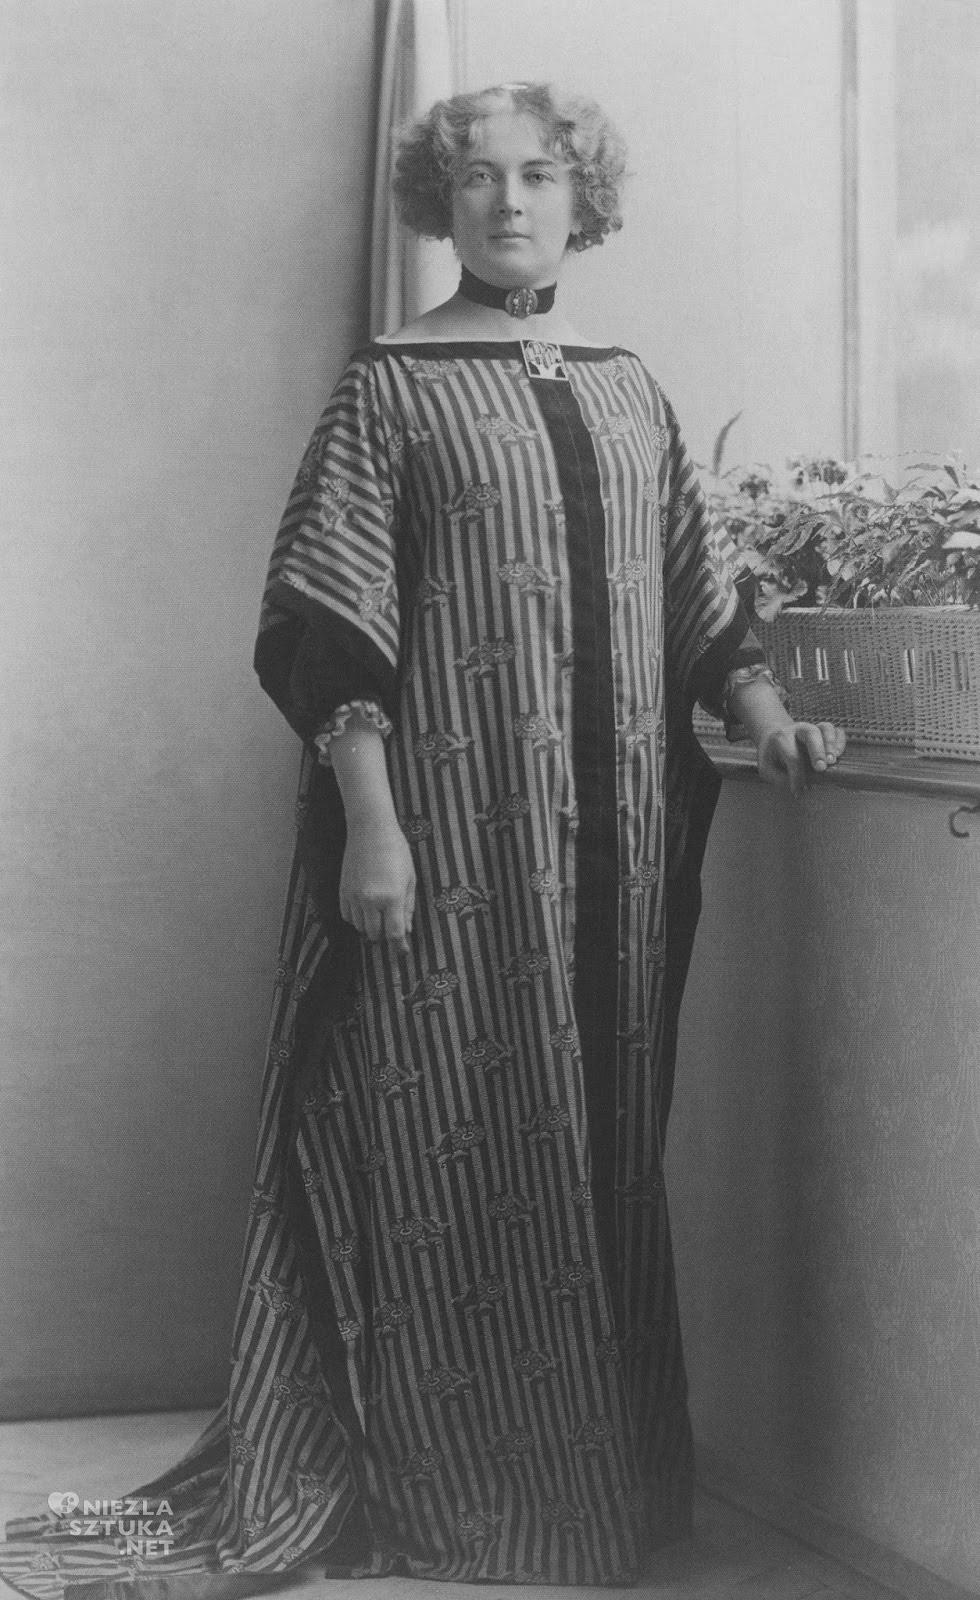 SoniaKnipsInWWDress-Fabric-byEduardWimmer-Wisgrill+1911+